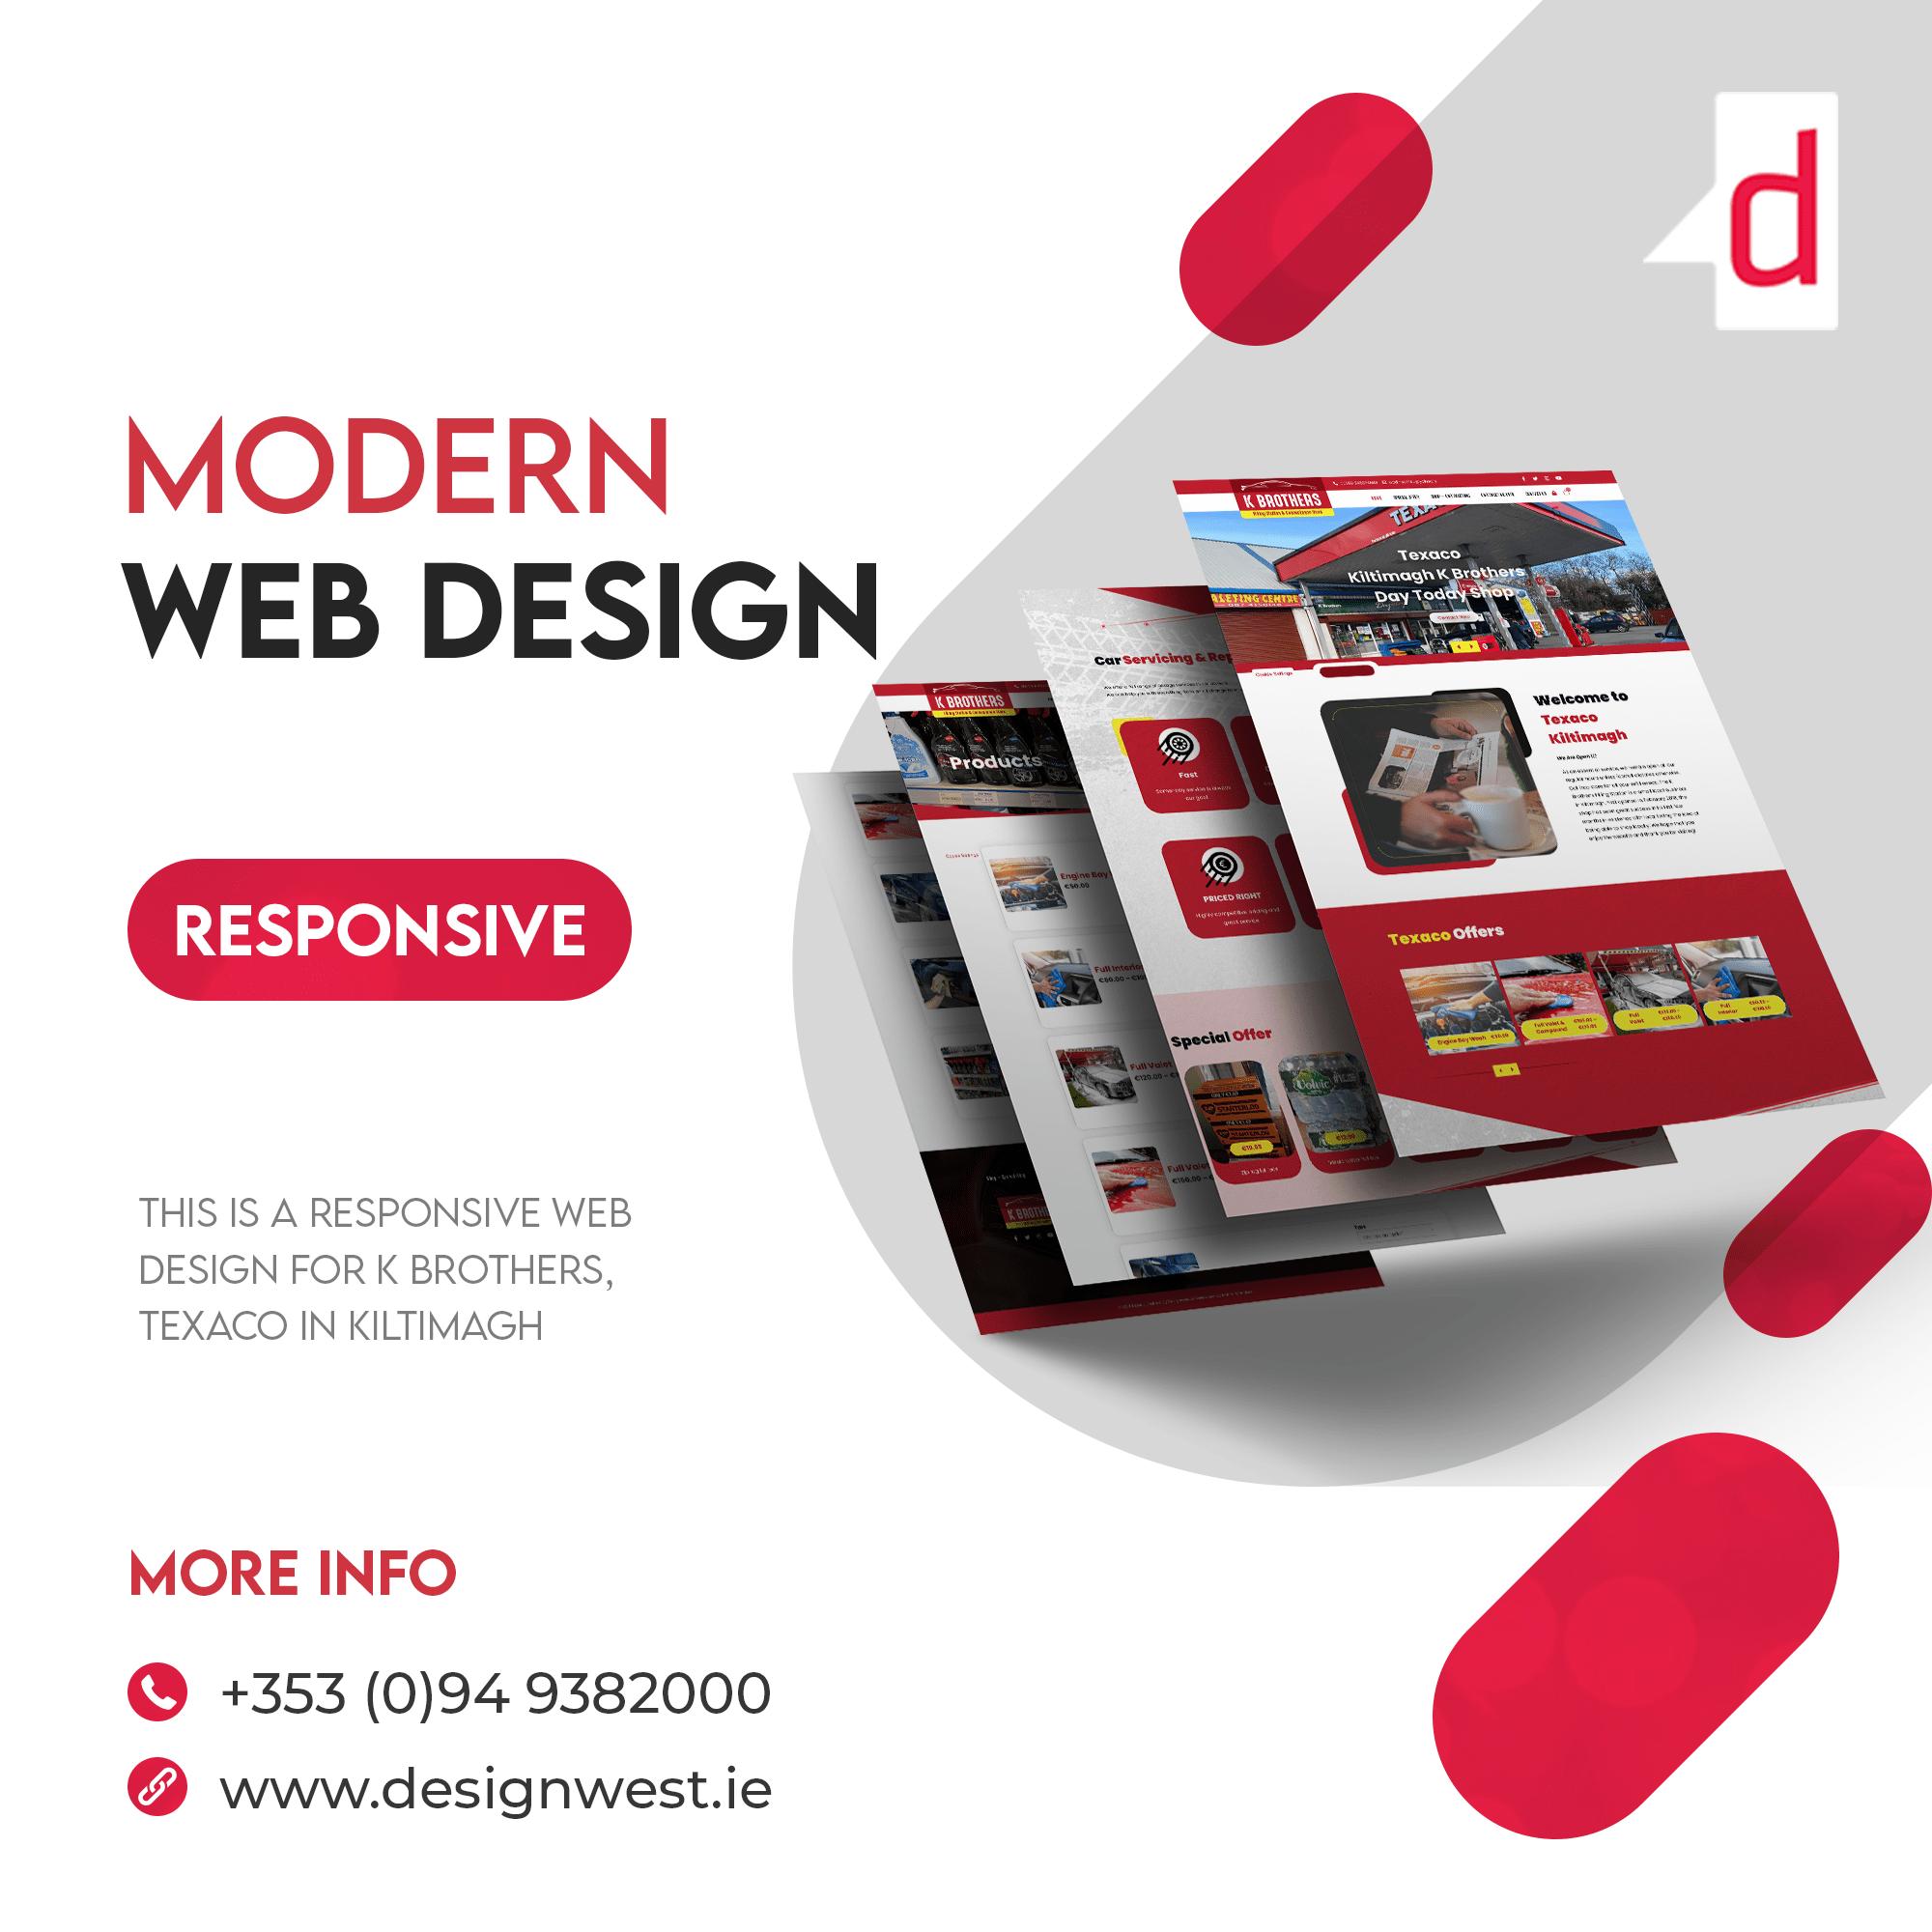 Web Designers Ireland for Texaco, Kiltimagh   Just Great Design 2021